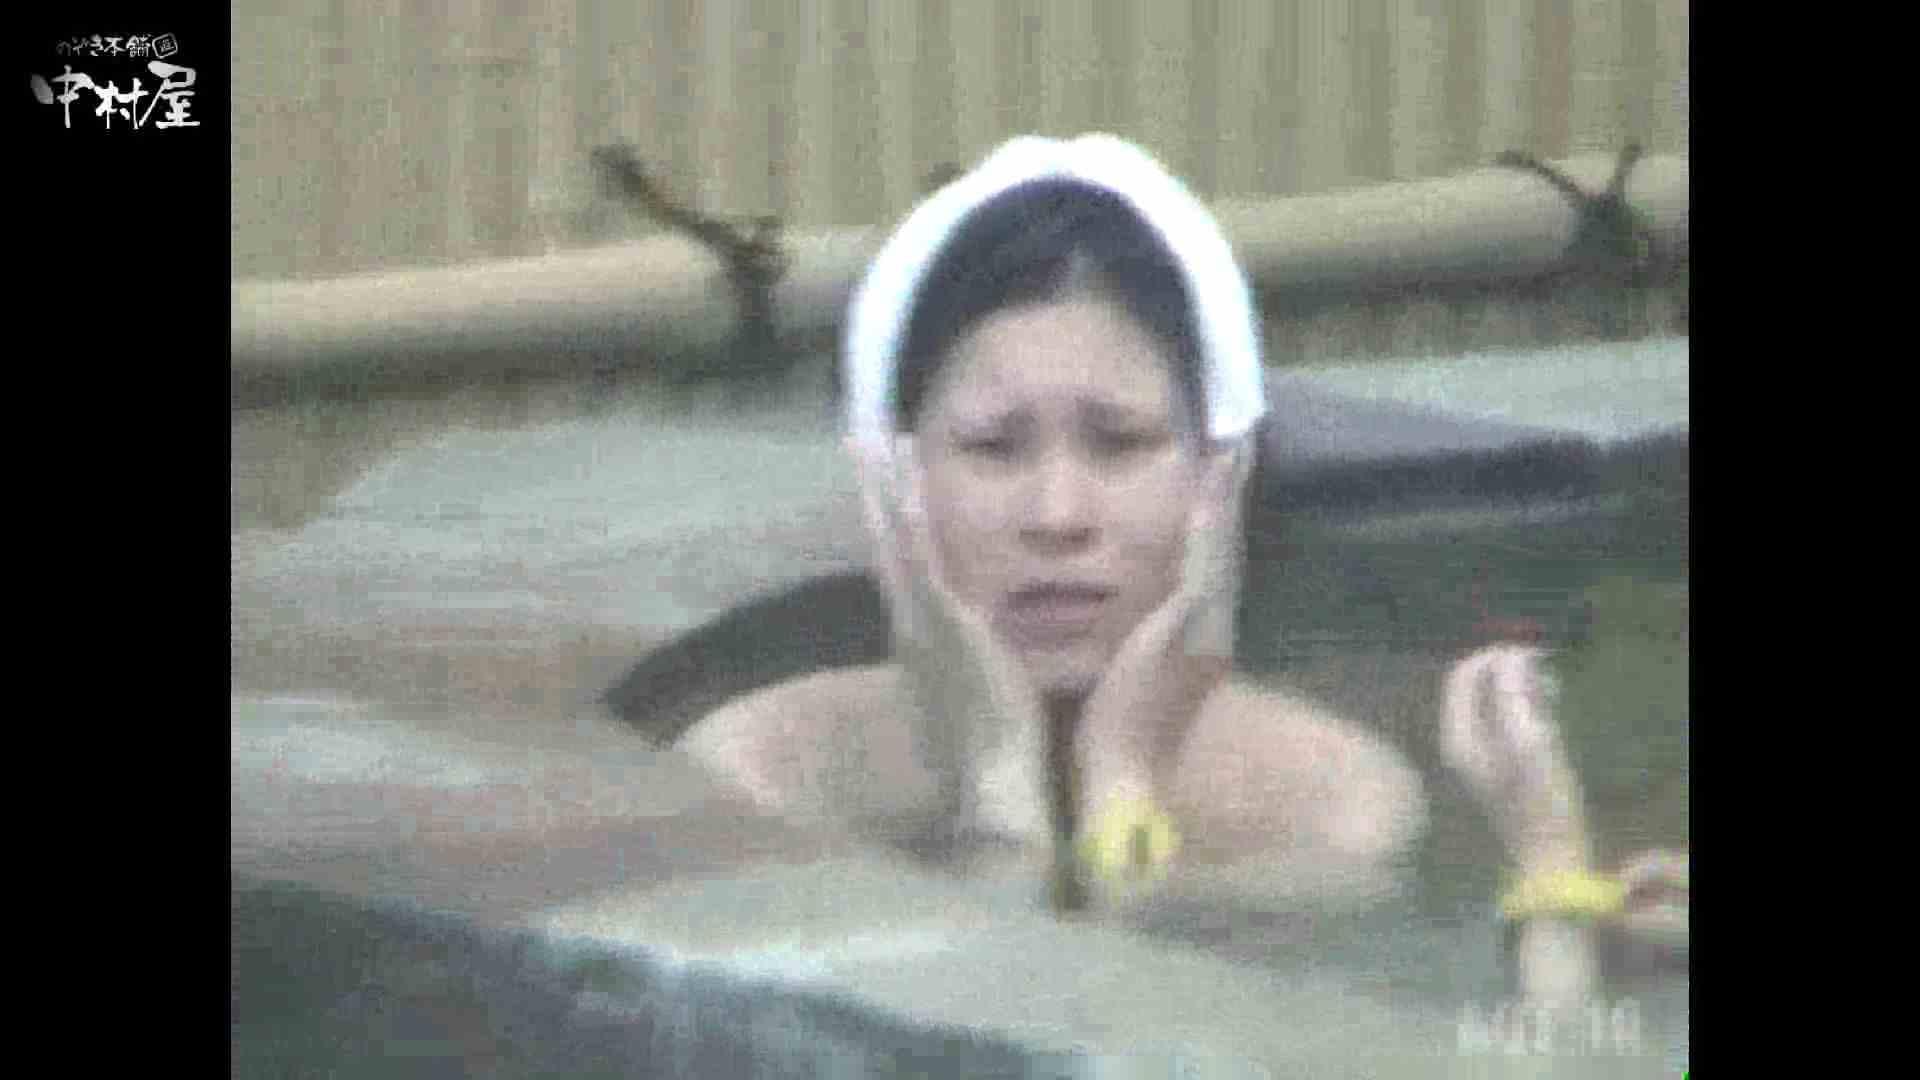 Aquaな露天風呂Vol.874潜入盗撮露天風呂十判湯 其の三 潜入突撃  77pic 36